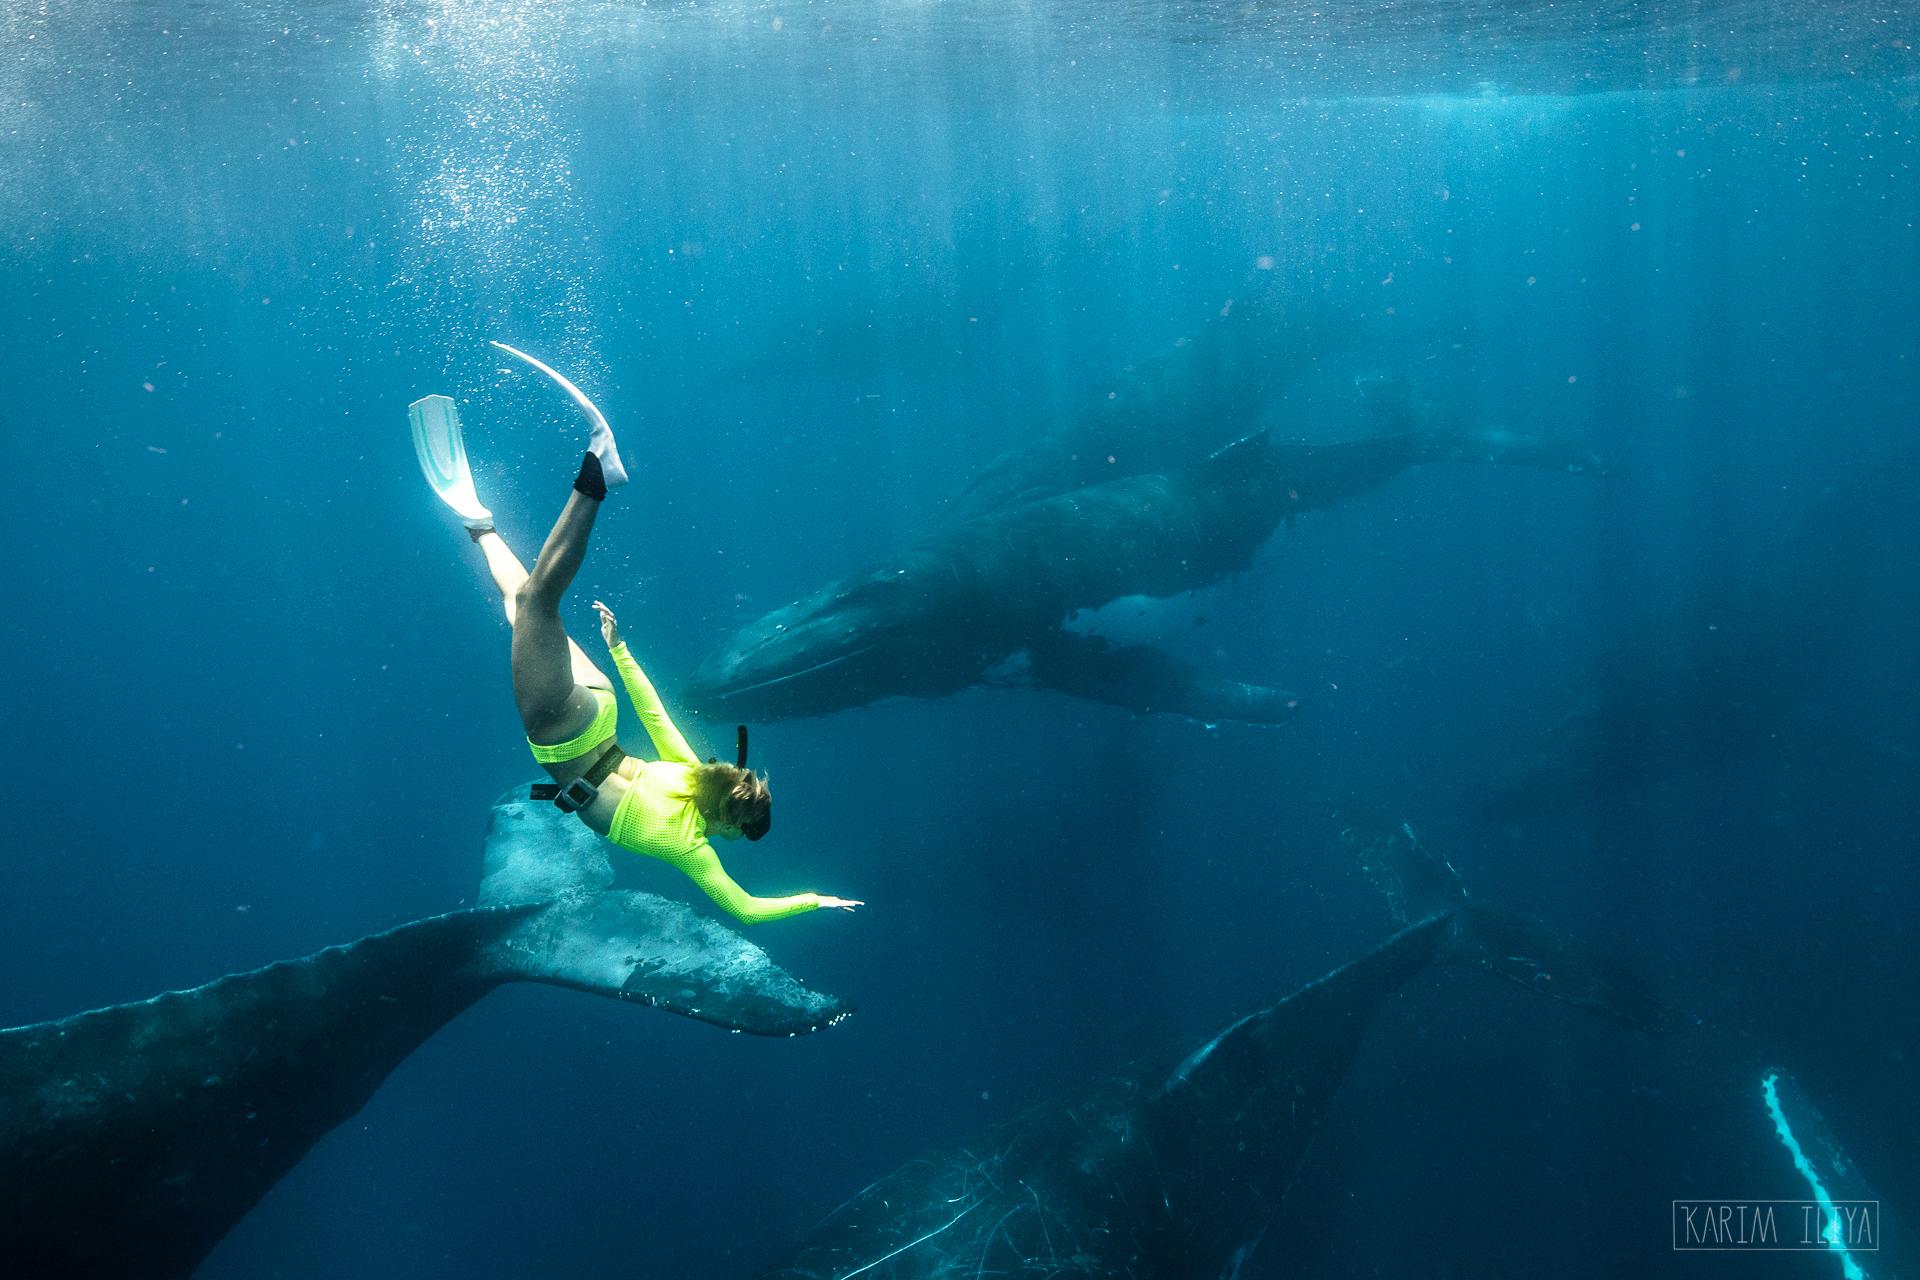 swim-with-whales-tonga-underwater-dive.jpg